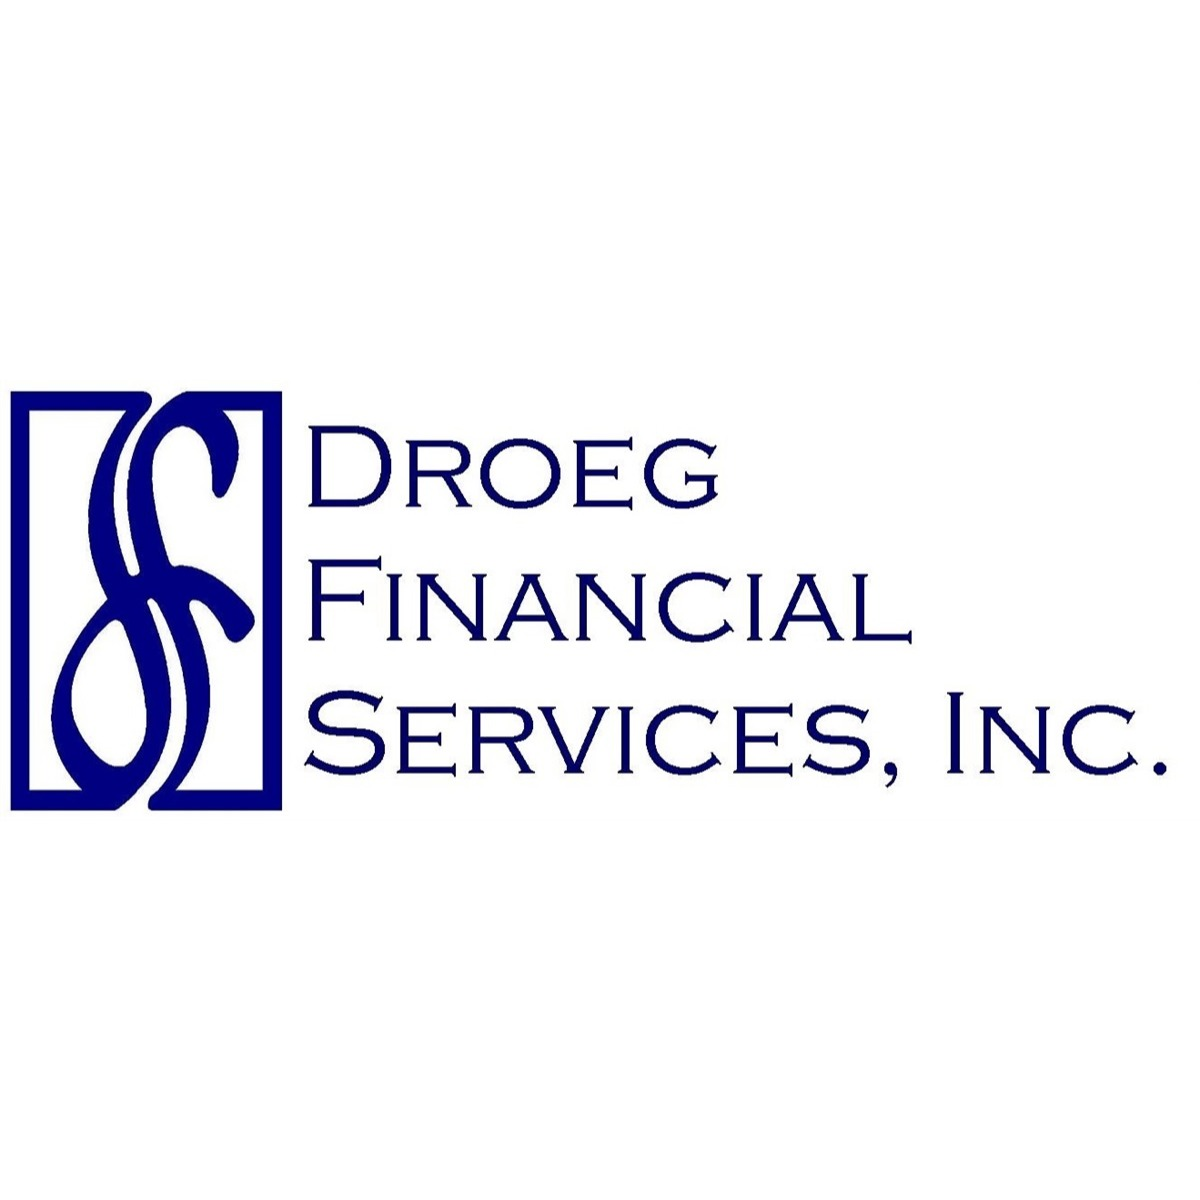 Droeg Financial Services, Inc.